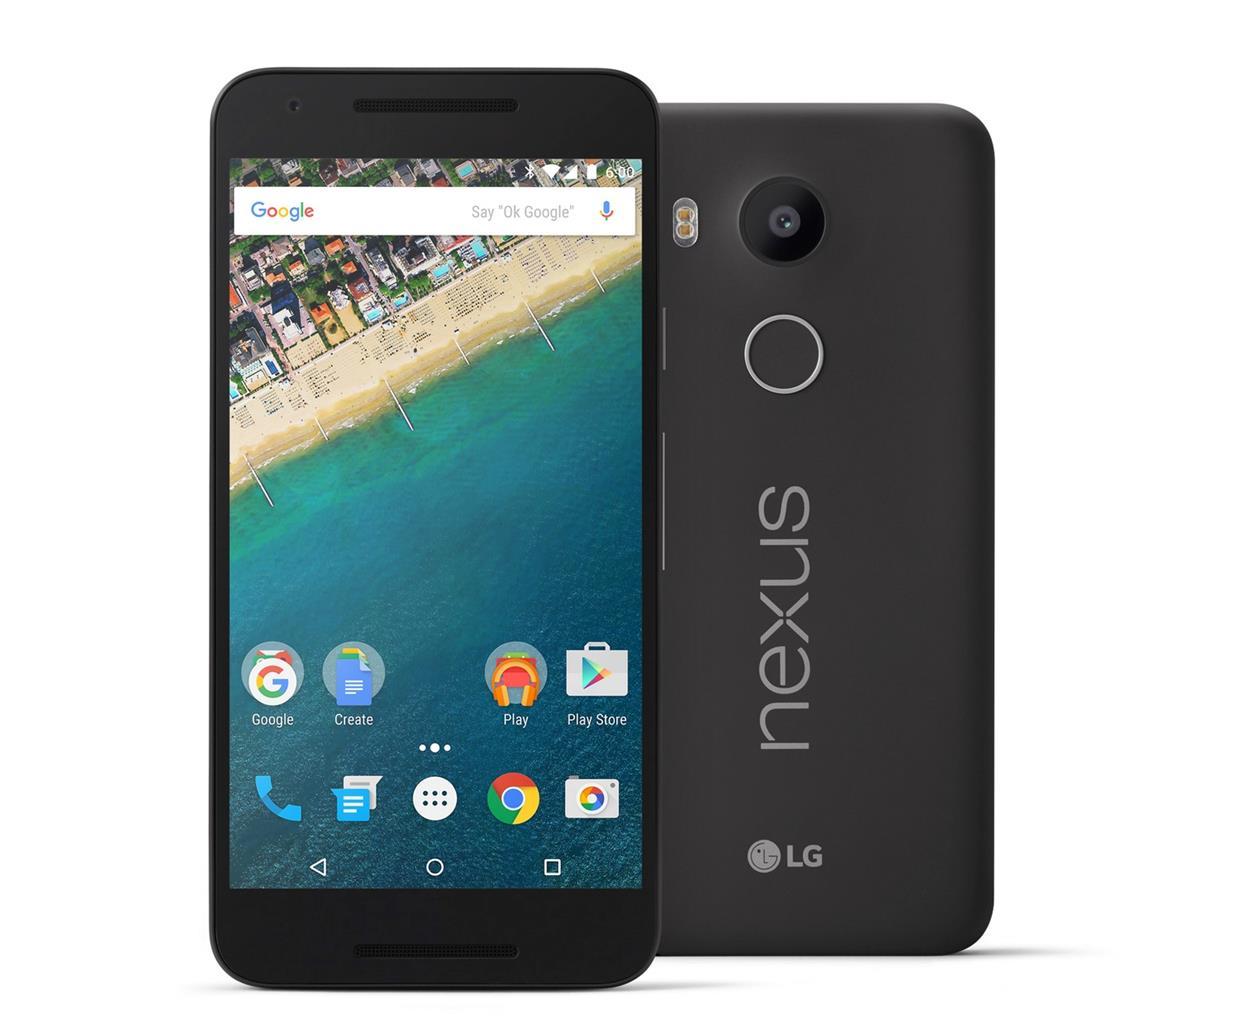 lg nexus 5x h790 16gb factory gsm unlocked 4g lte android smartphone us model ebay. Black Bedroom Furniture Sets. Home Design Ideas